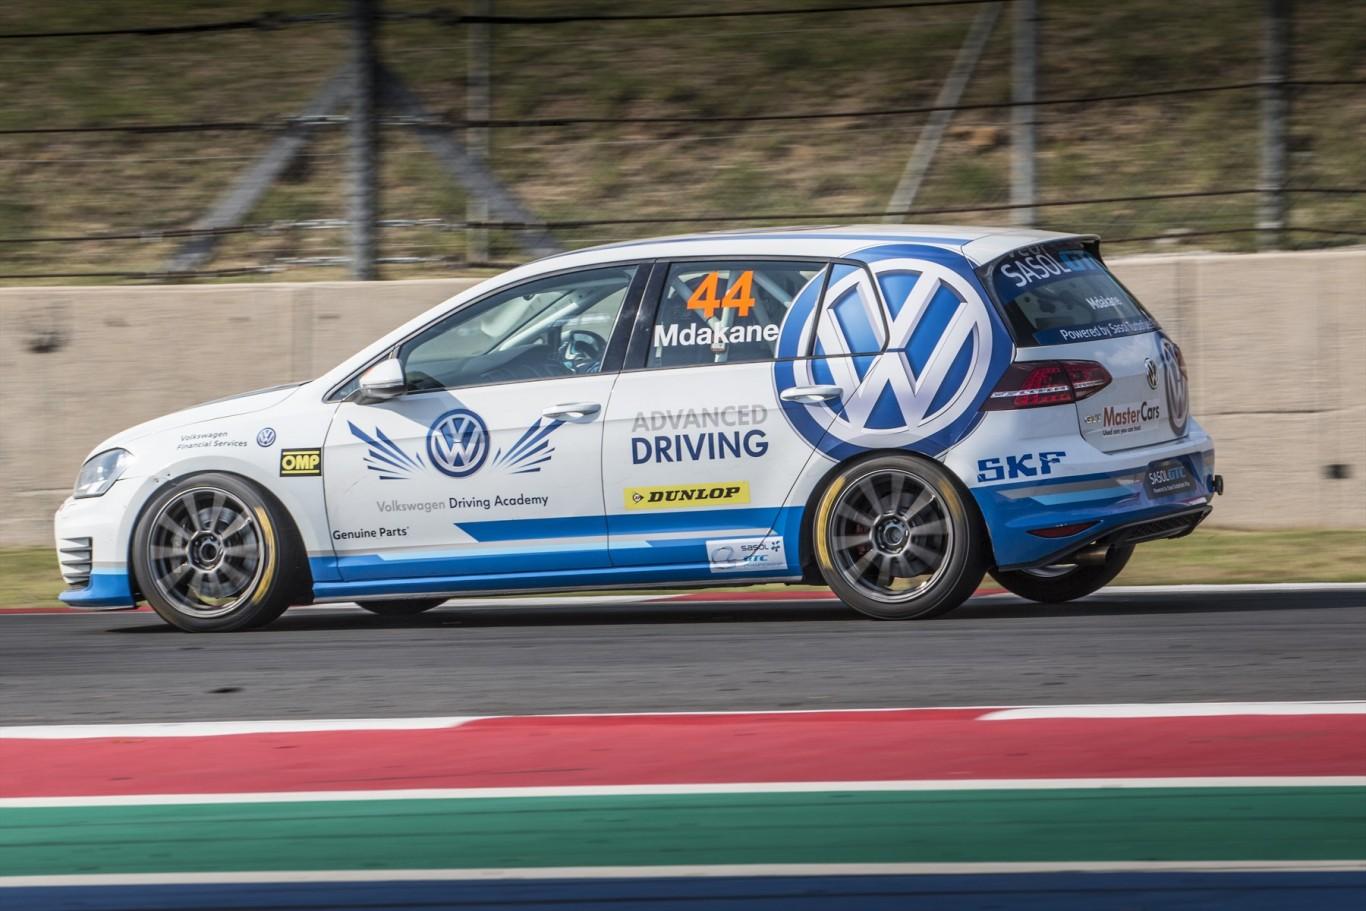 Volkswagen Motorsport turns the table to dominate at Kyalami in Sasol GTC series